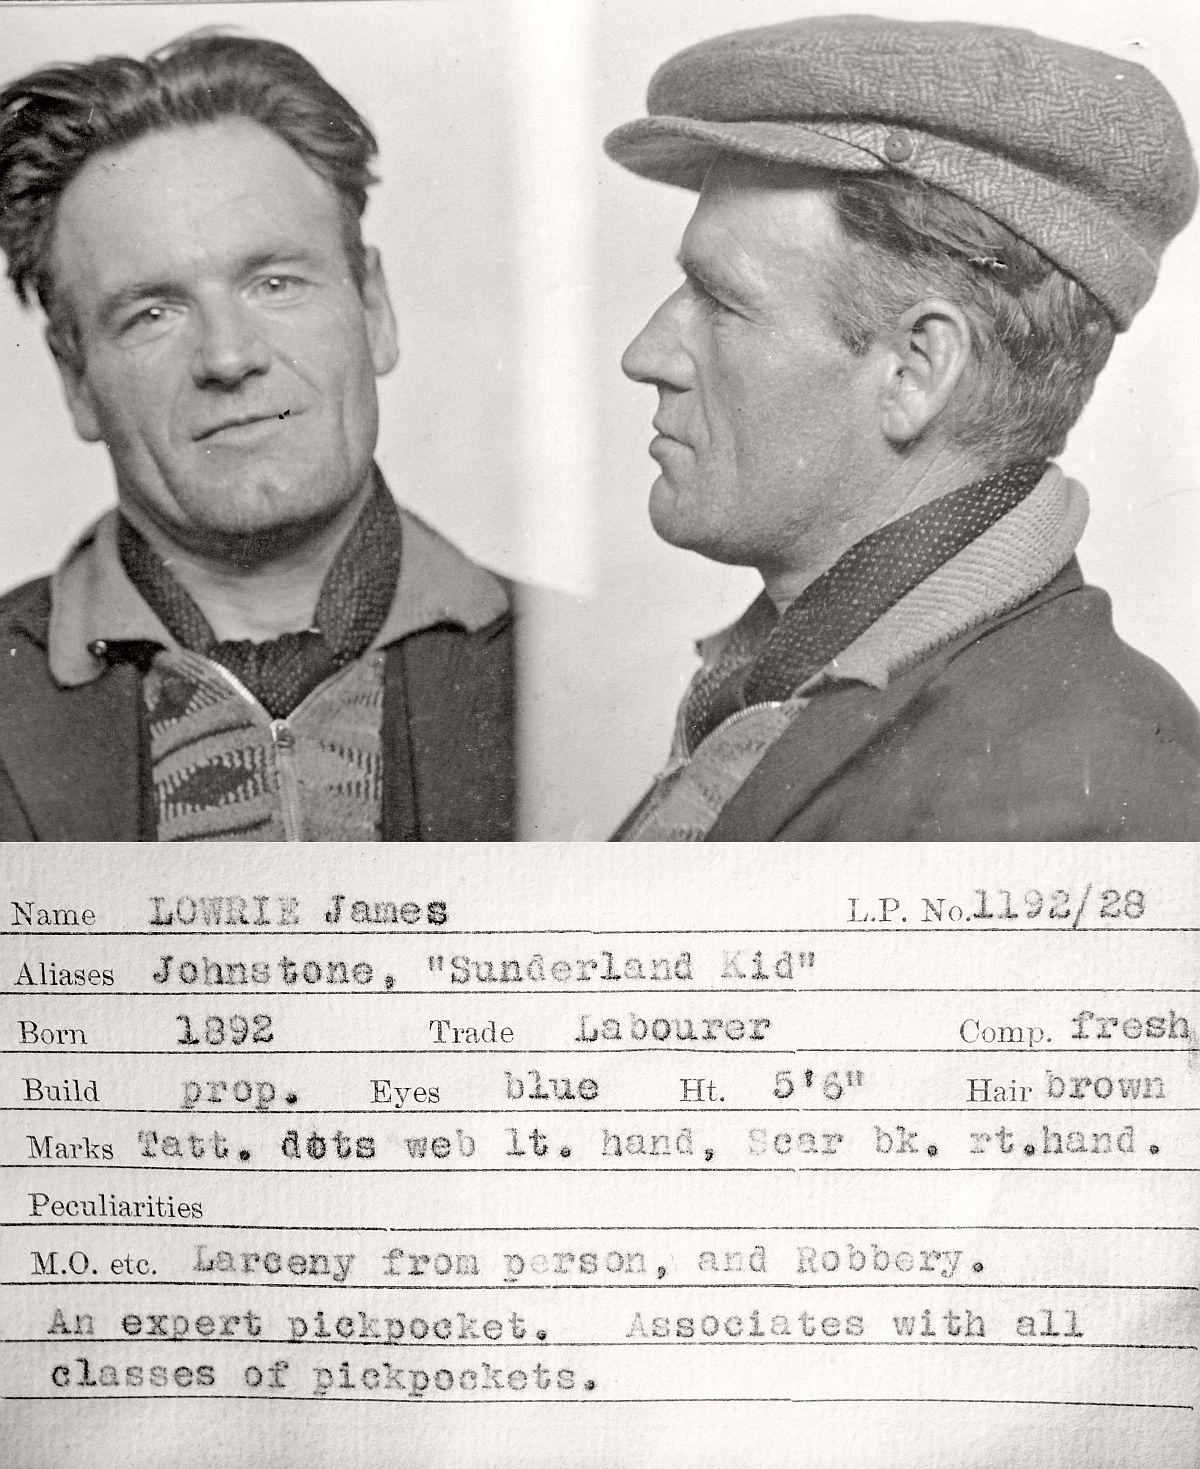 vintage-mug-shot-of-criminals-from-newcastle-upon-tyne-1930s-10